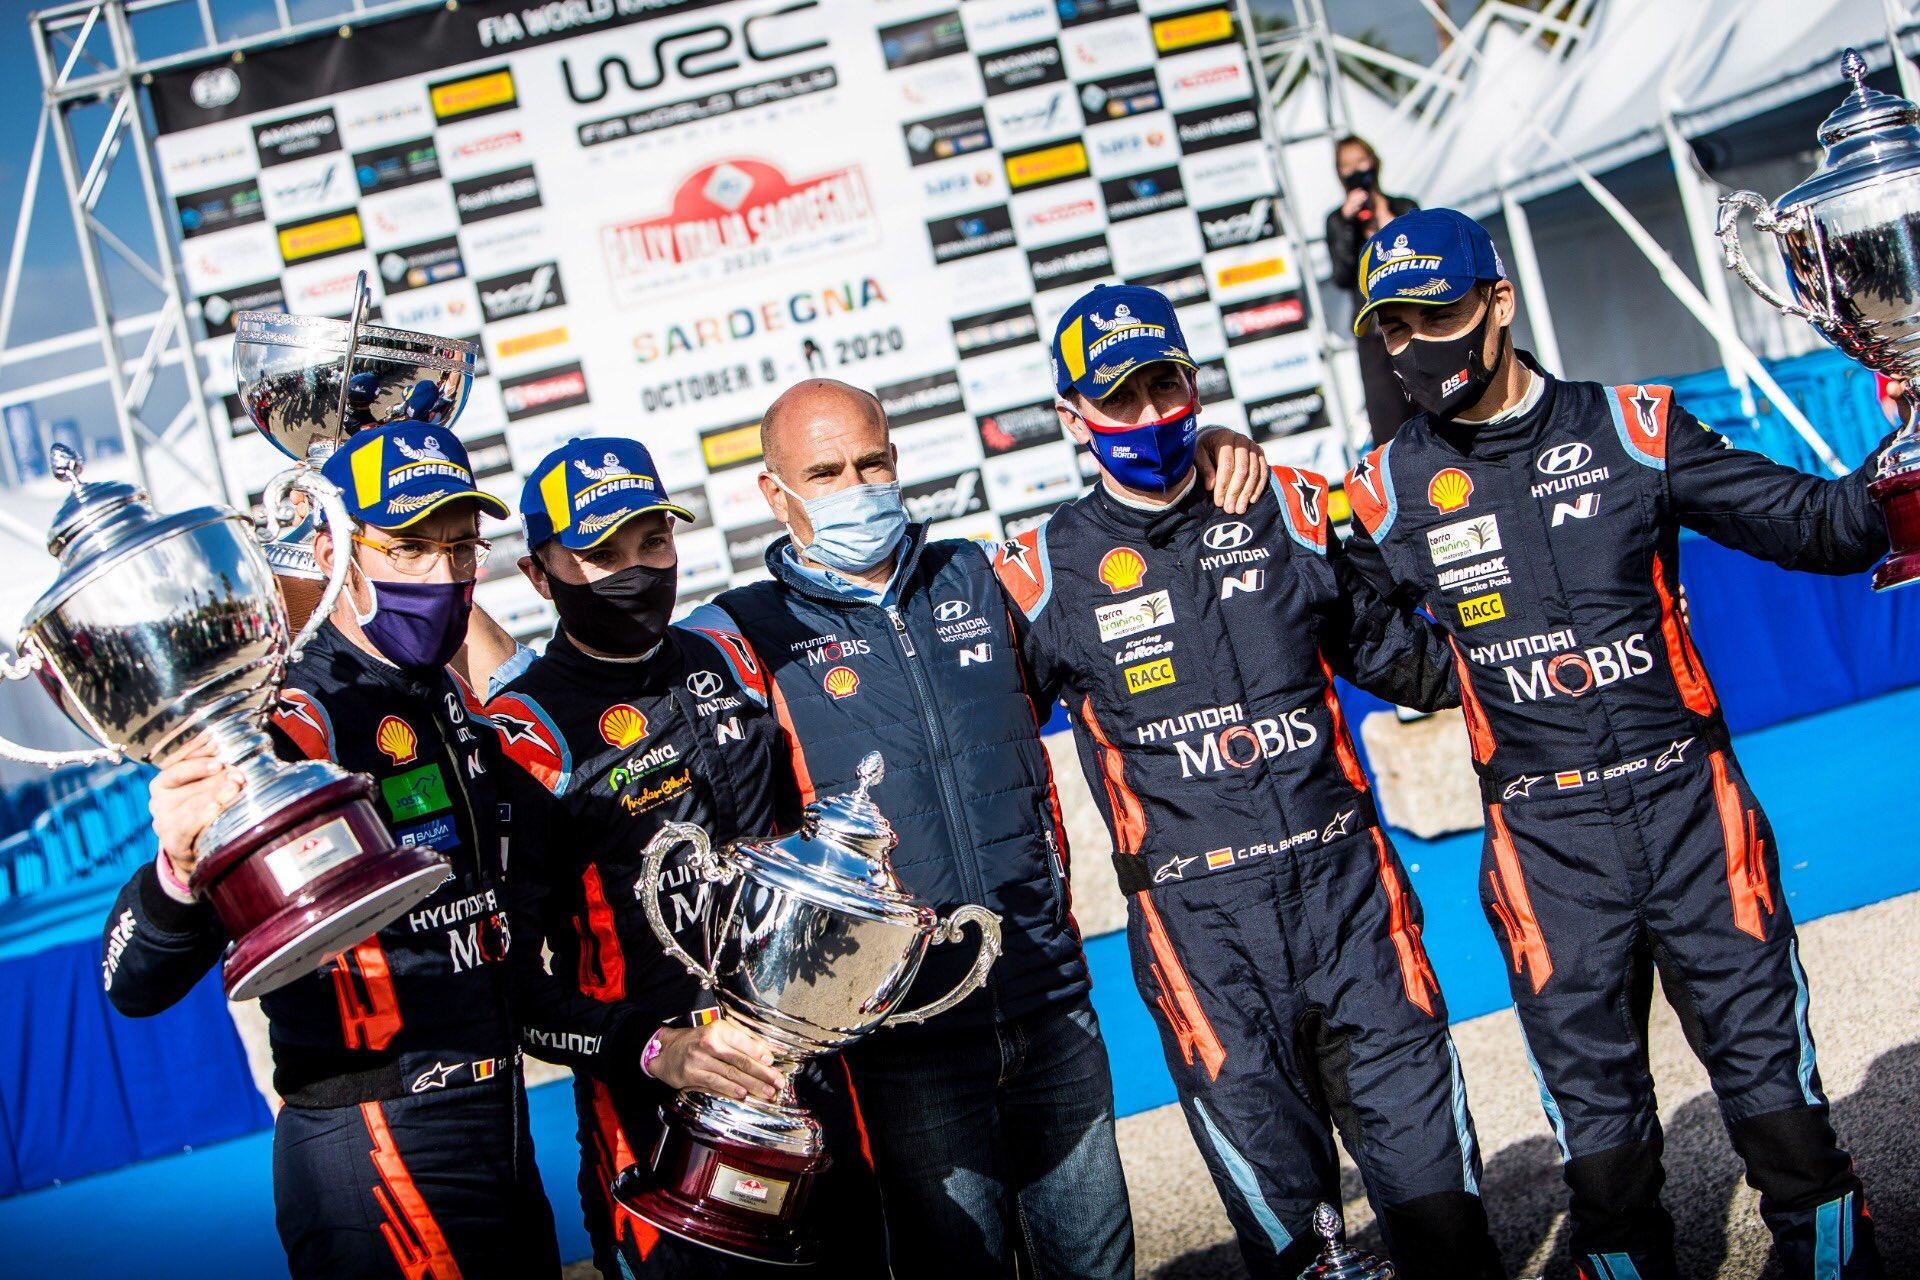 WRC: Rally d' Italia - Sardegna [8-10 Octubre] - Página 7 EkDzqxkXgAIbk1L?format=jpg&name=large